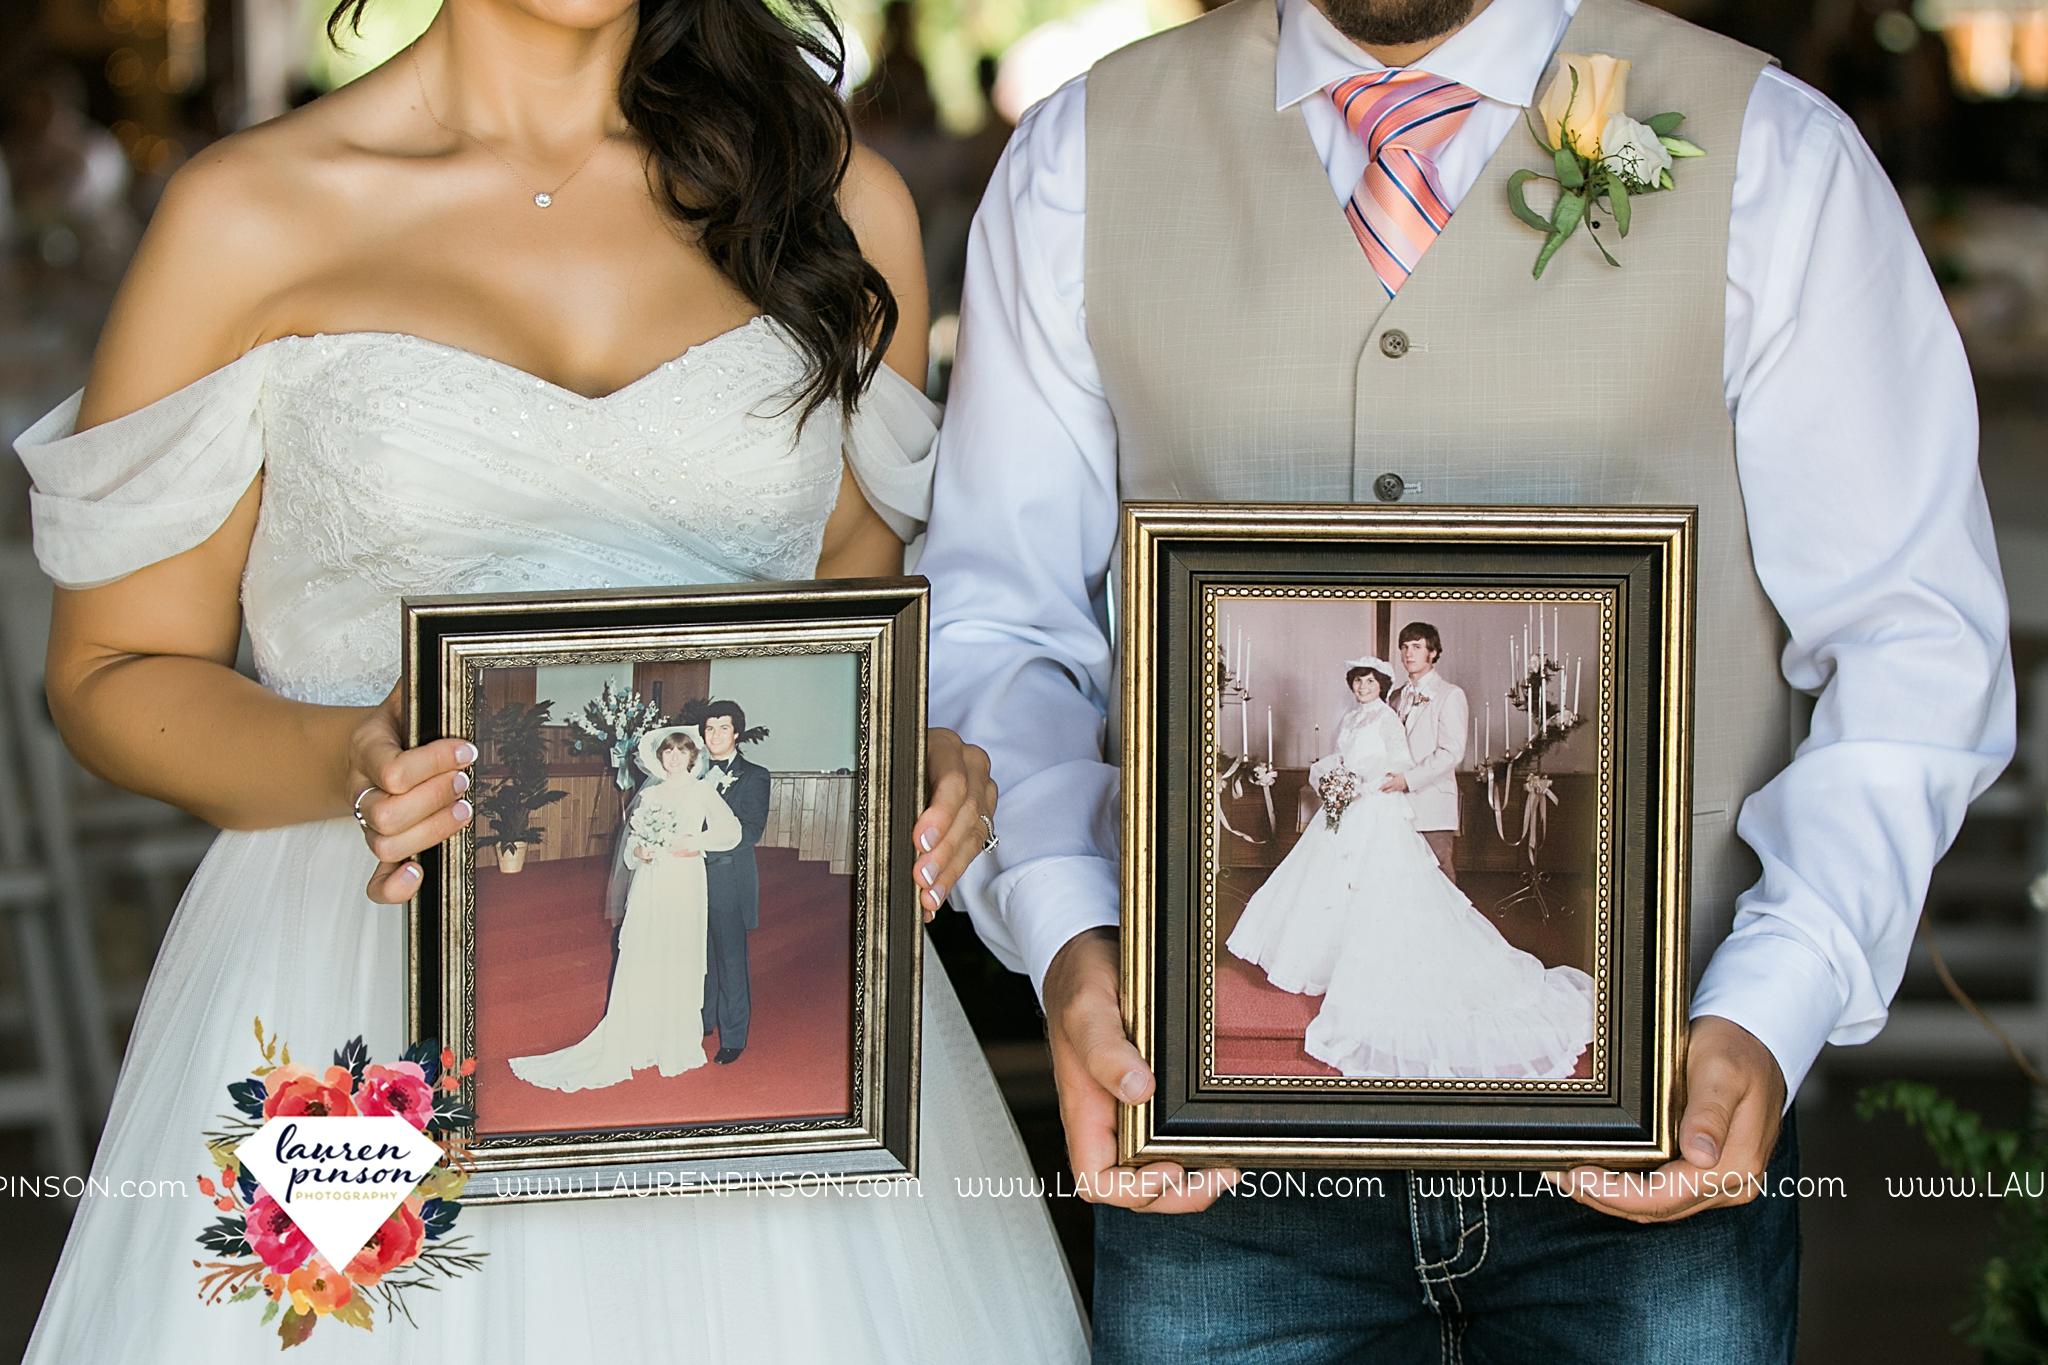 jones-barn-willow-creek-ranch-wedding-in-cleburne-texas-fort-worth-dfw-wichita-falls-wedding-photography_3229.jpg